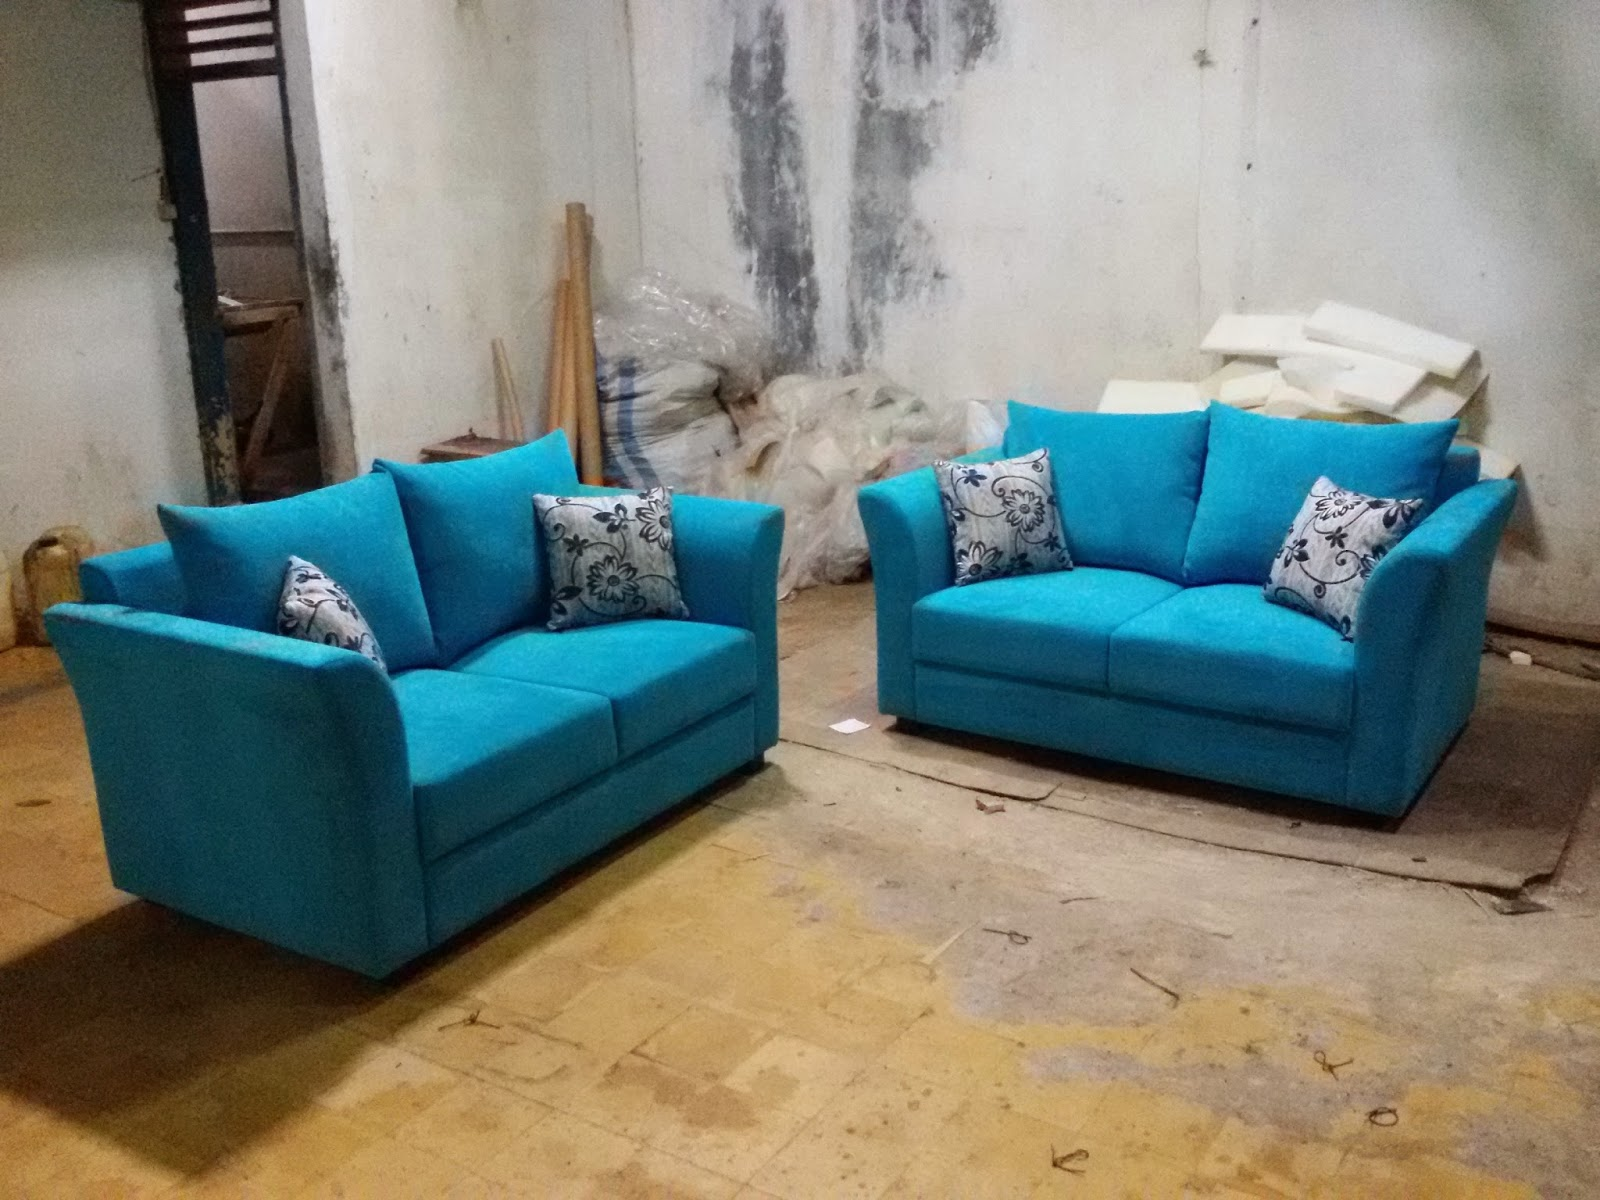 jual sofa bed murah di jakarta selatan full size mattress minimalis timur stkittsvilla